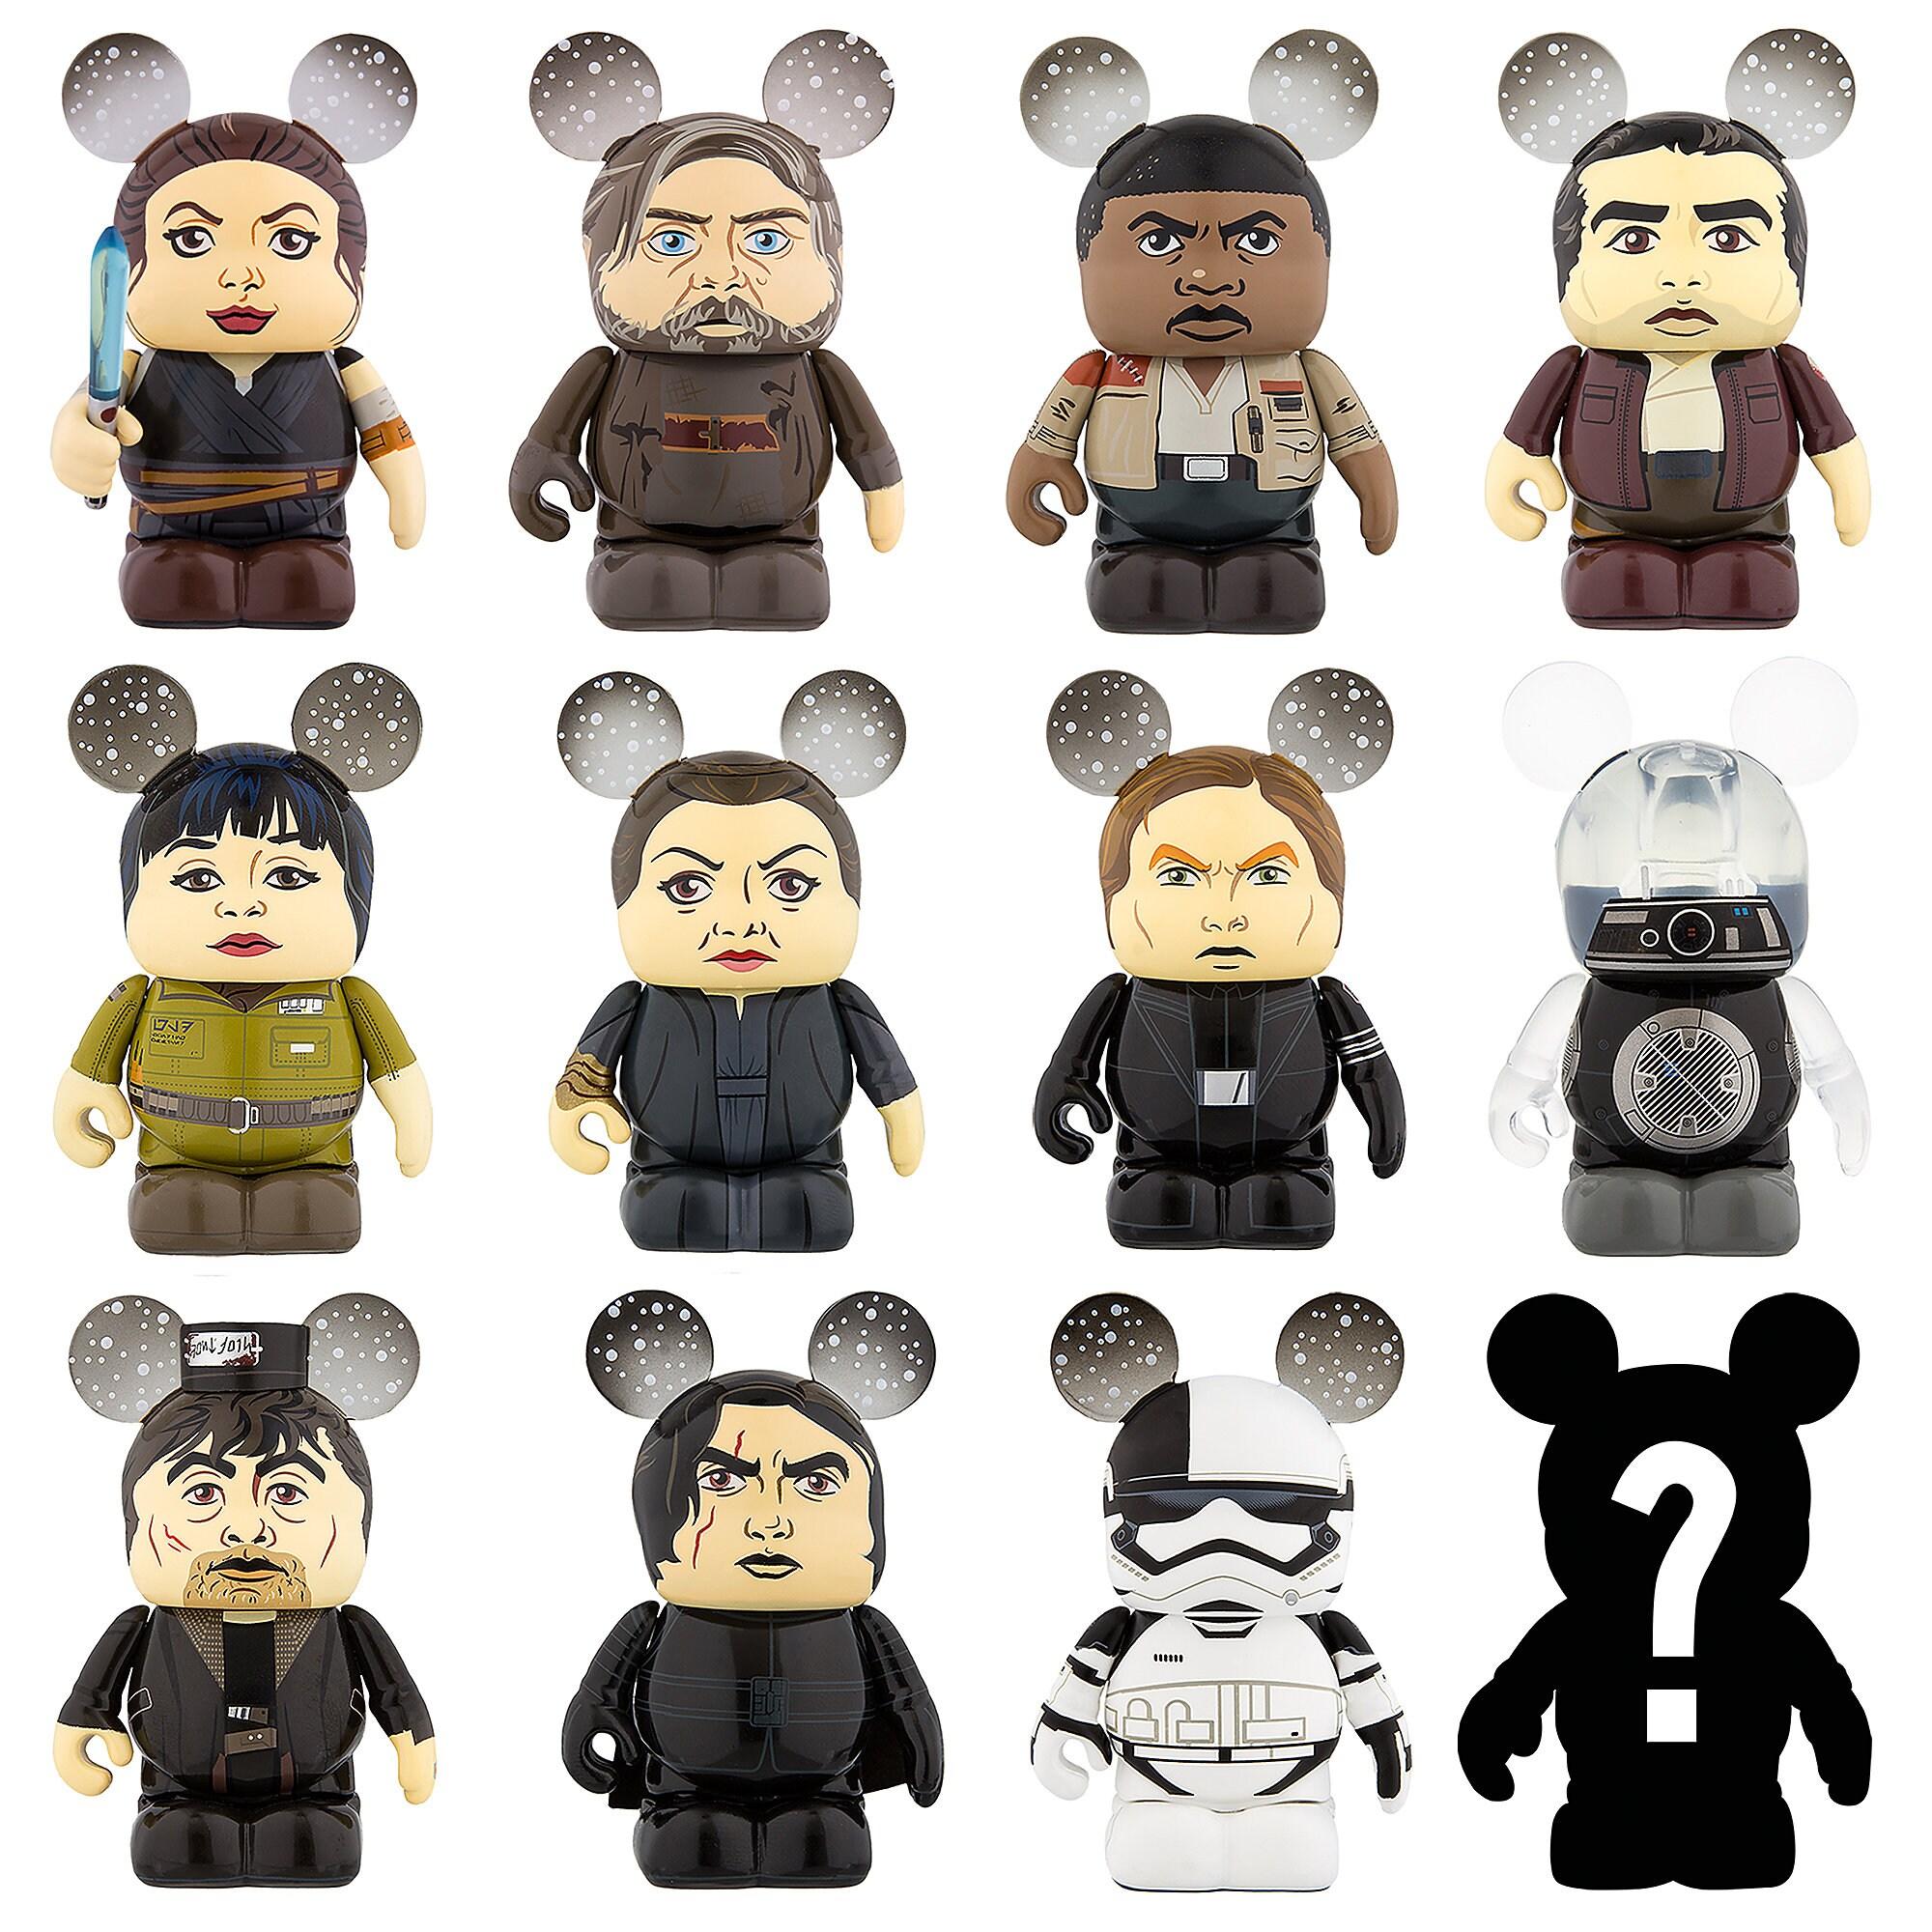 Vinylmation Star Wars: The Last Jedi Series Figure - 3''